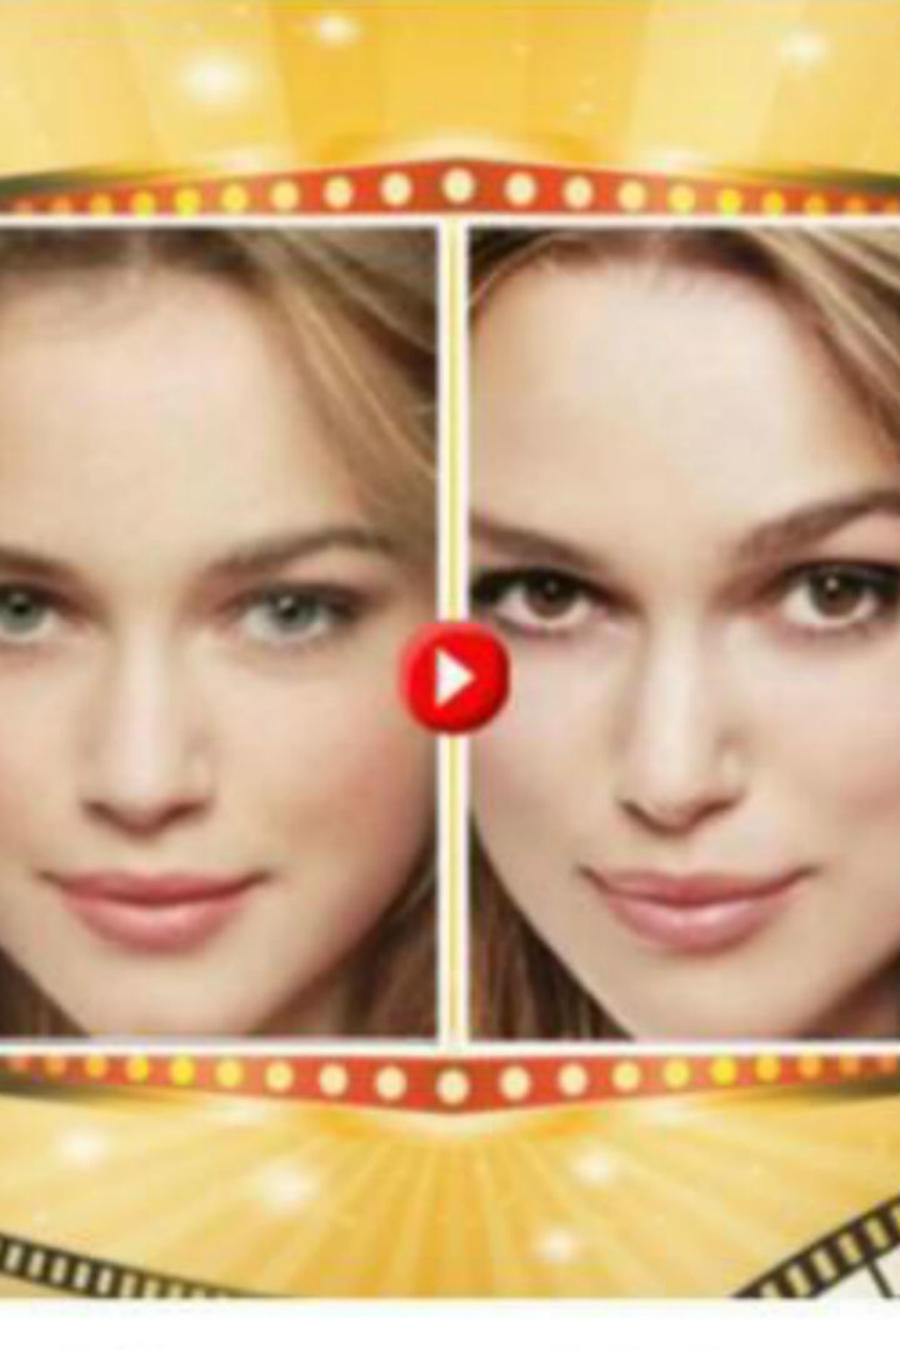 Imagen de promo en Facebook ¿A qué famoso te pareces?